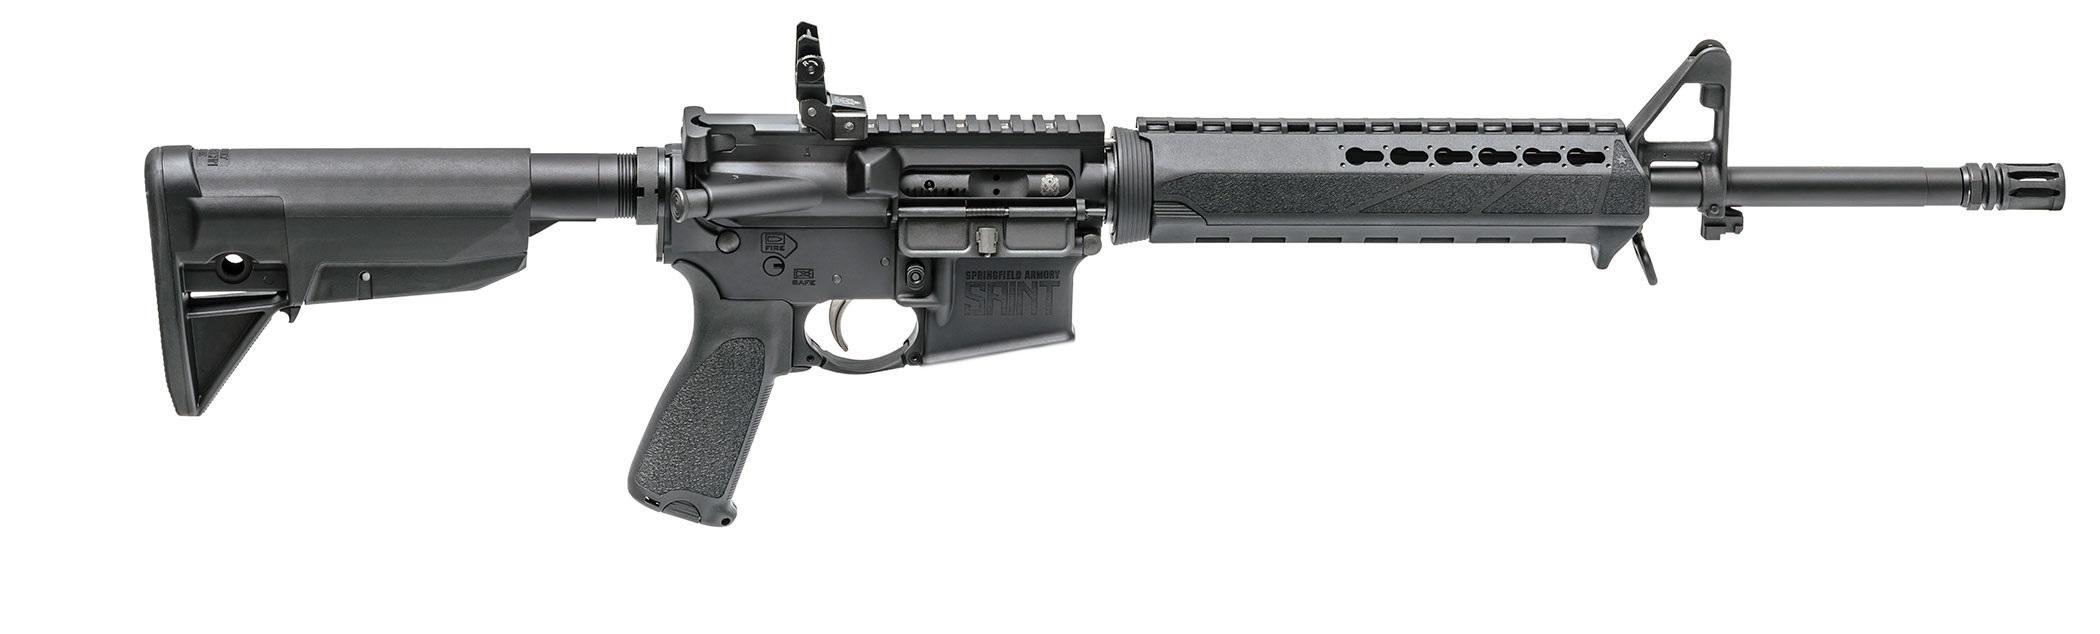 Springfield Armory Saint Edge 223 Rem   5.56 NATO